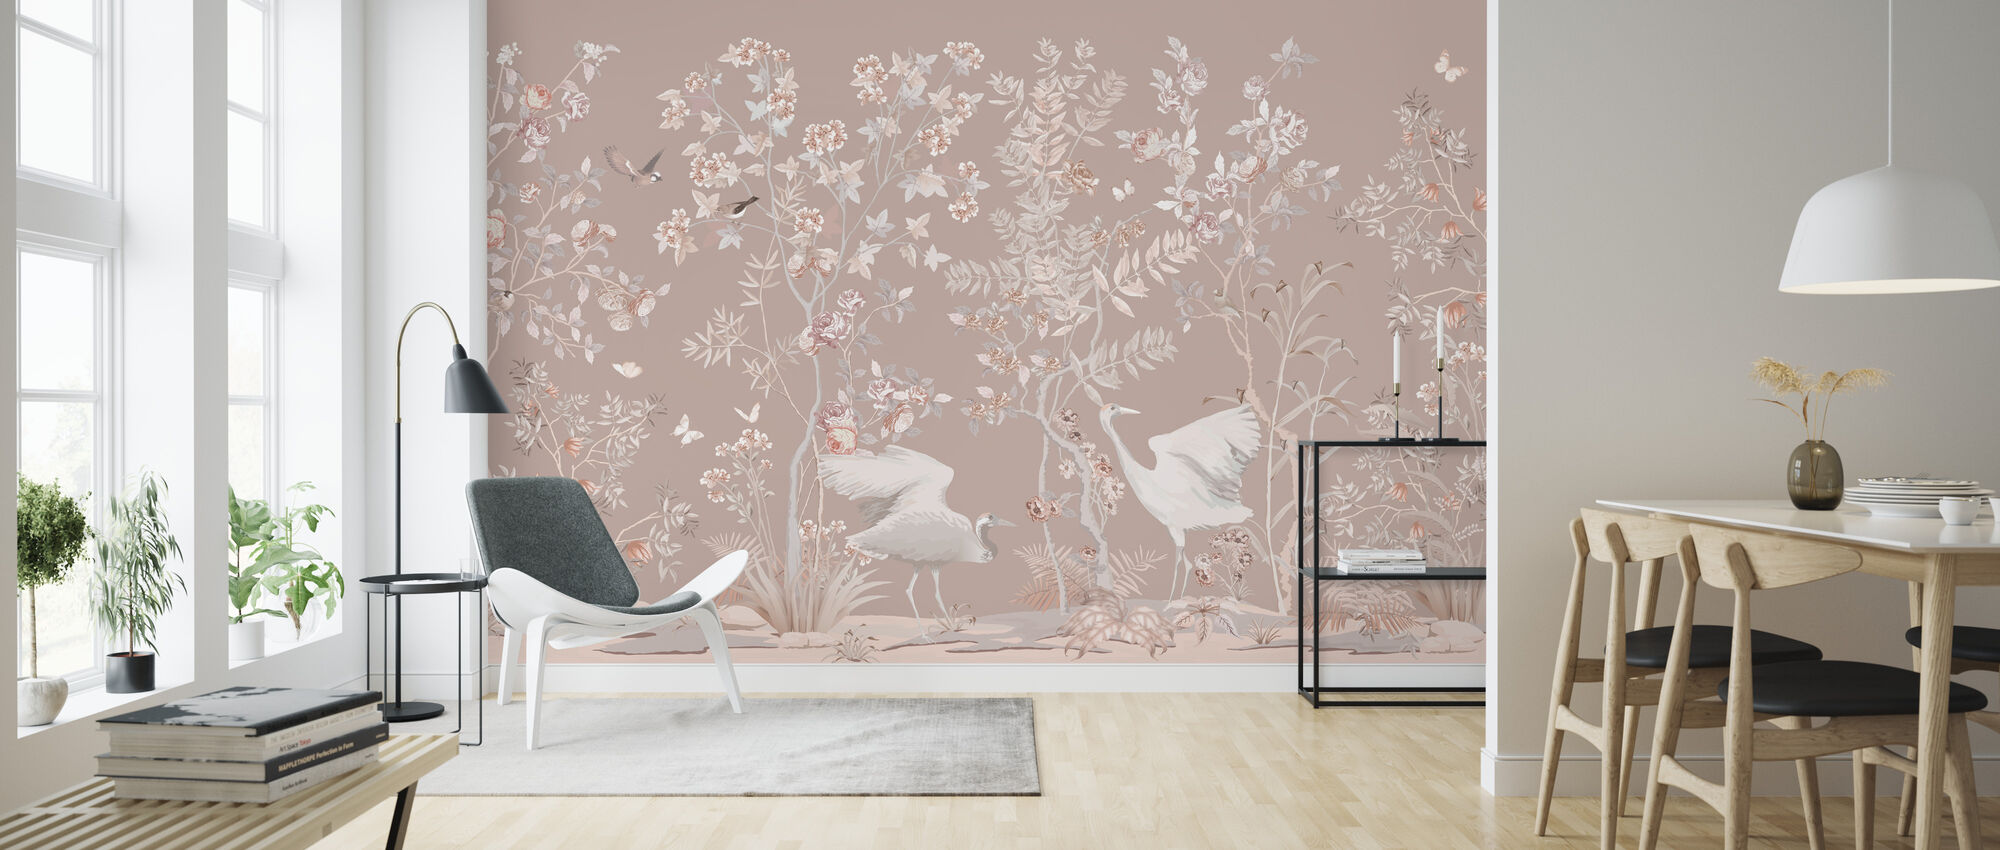 Birds Garden - Wallpaper - Living Room